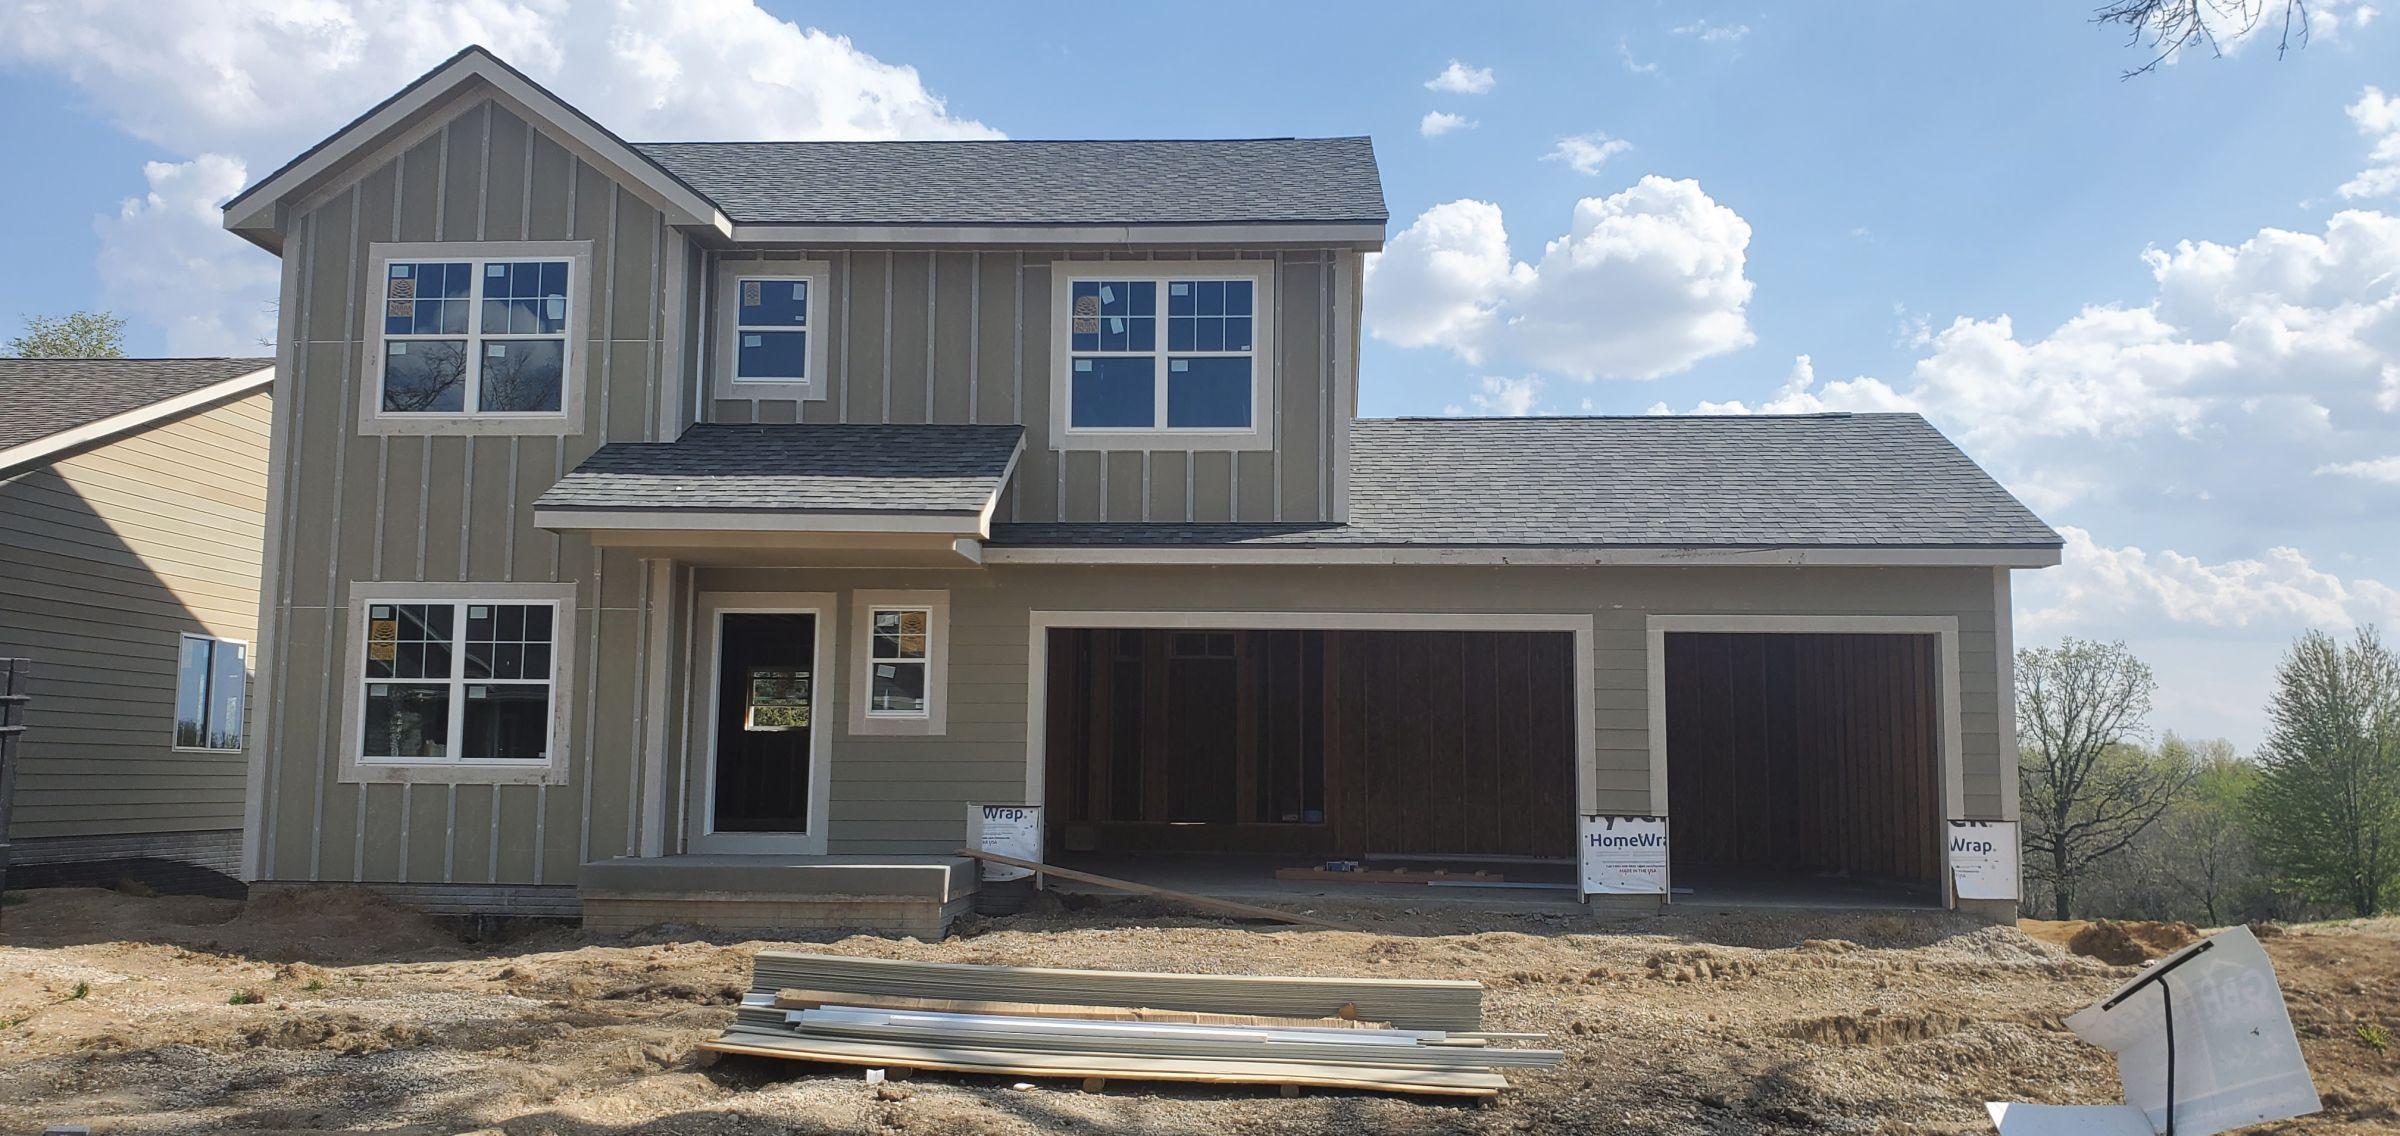 residential-jasper-county-iowa-0-acres-listing-number-15432-0-2021-05-03-143029.jpg